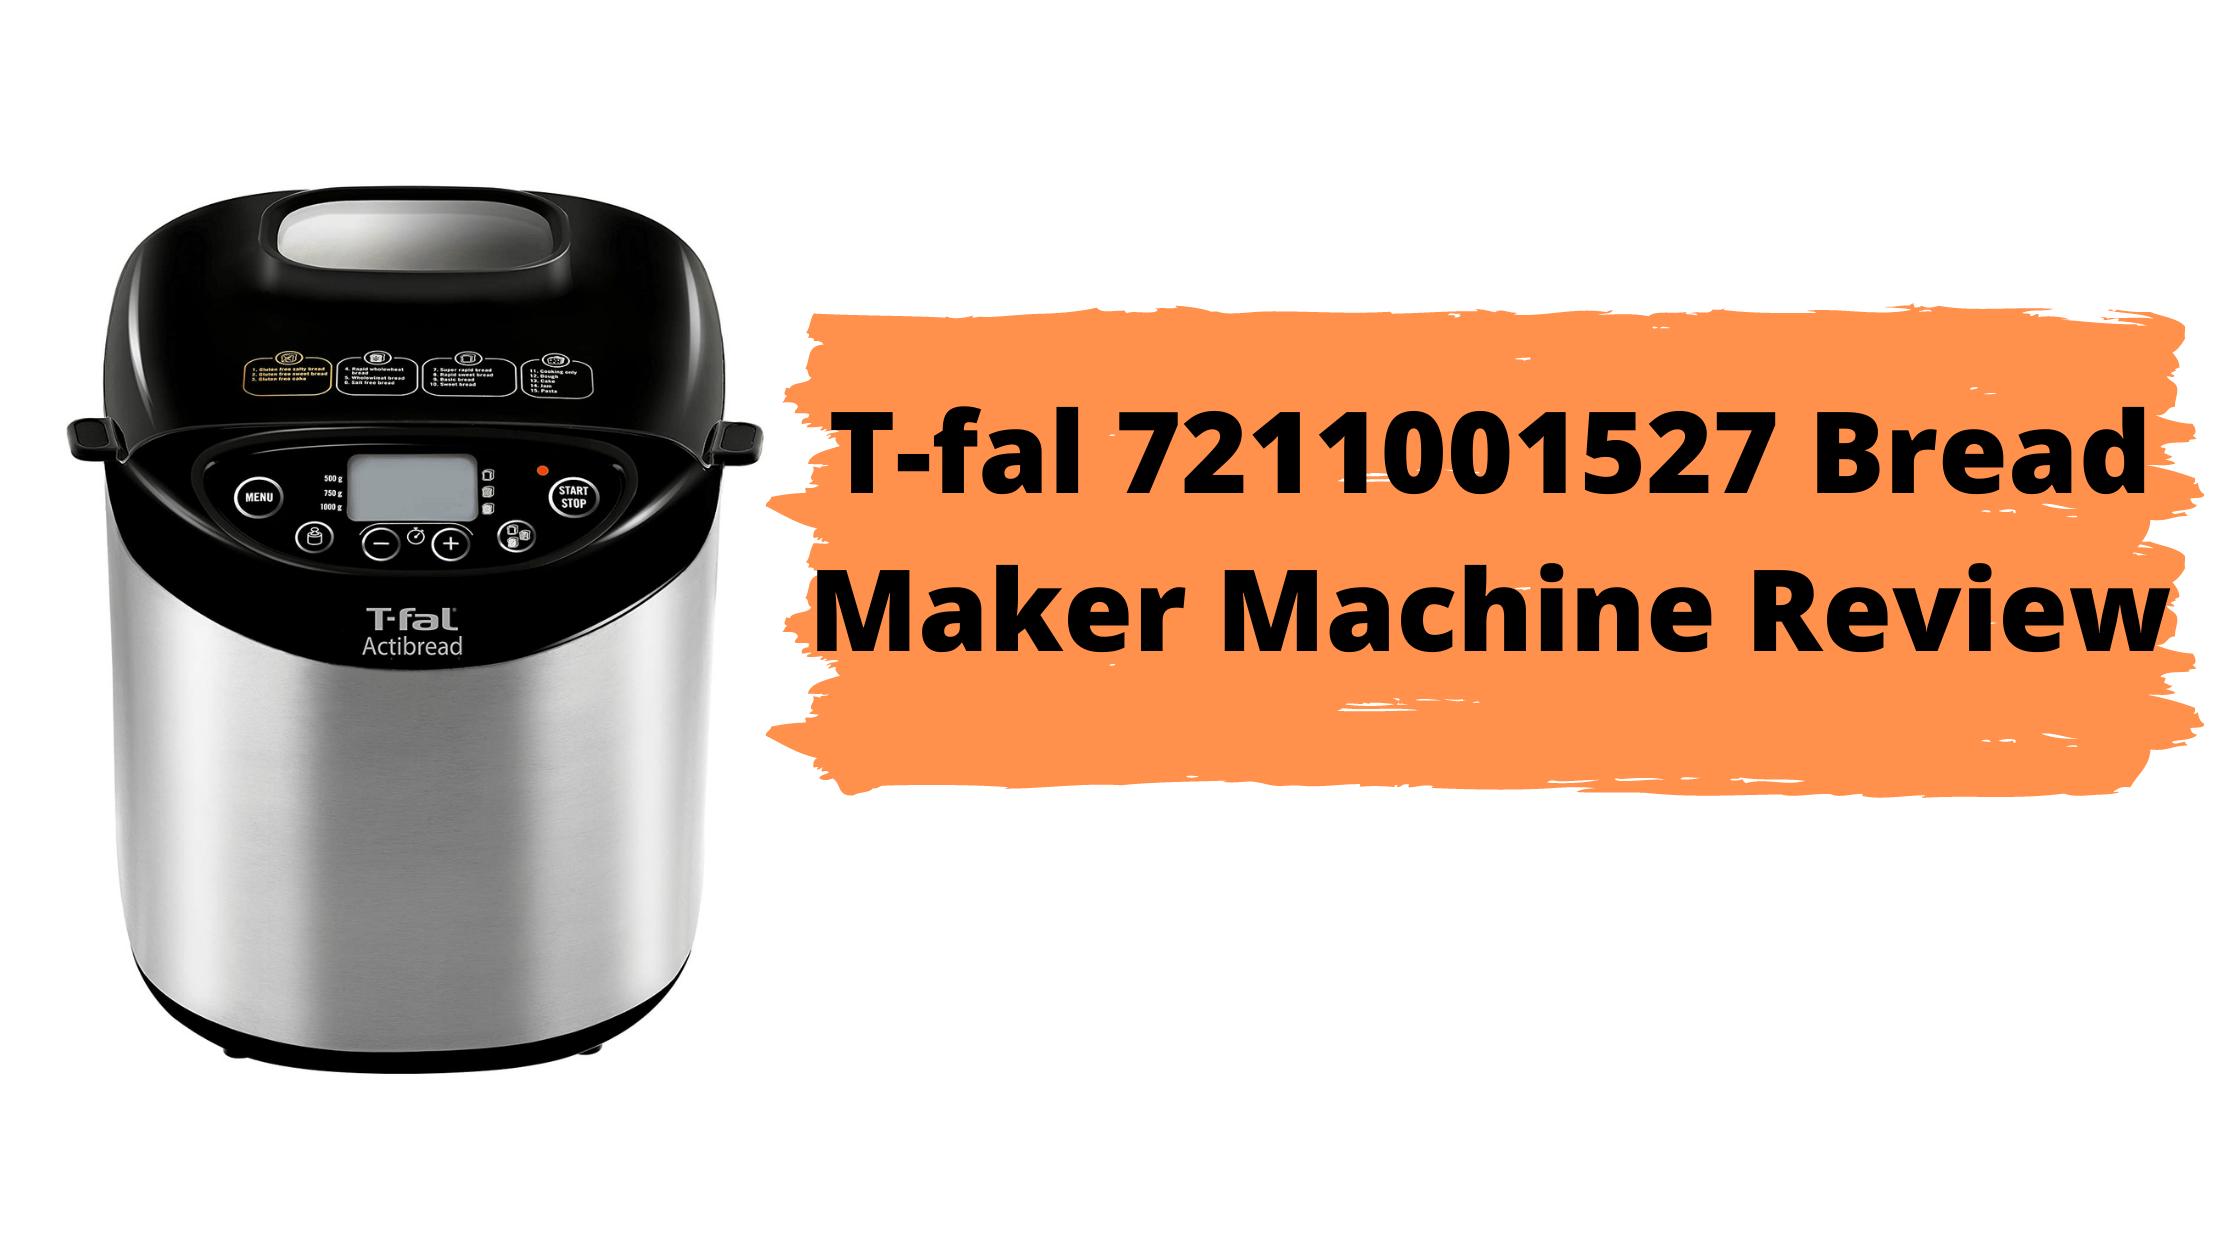 T-fal 7211001527 Bread Machine Review